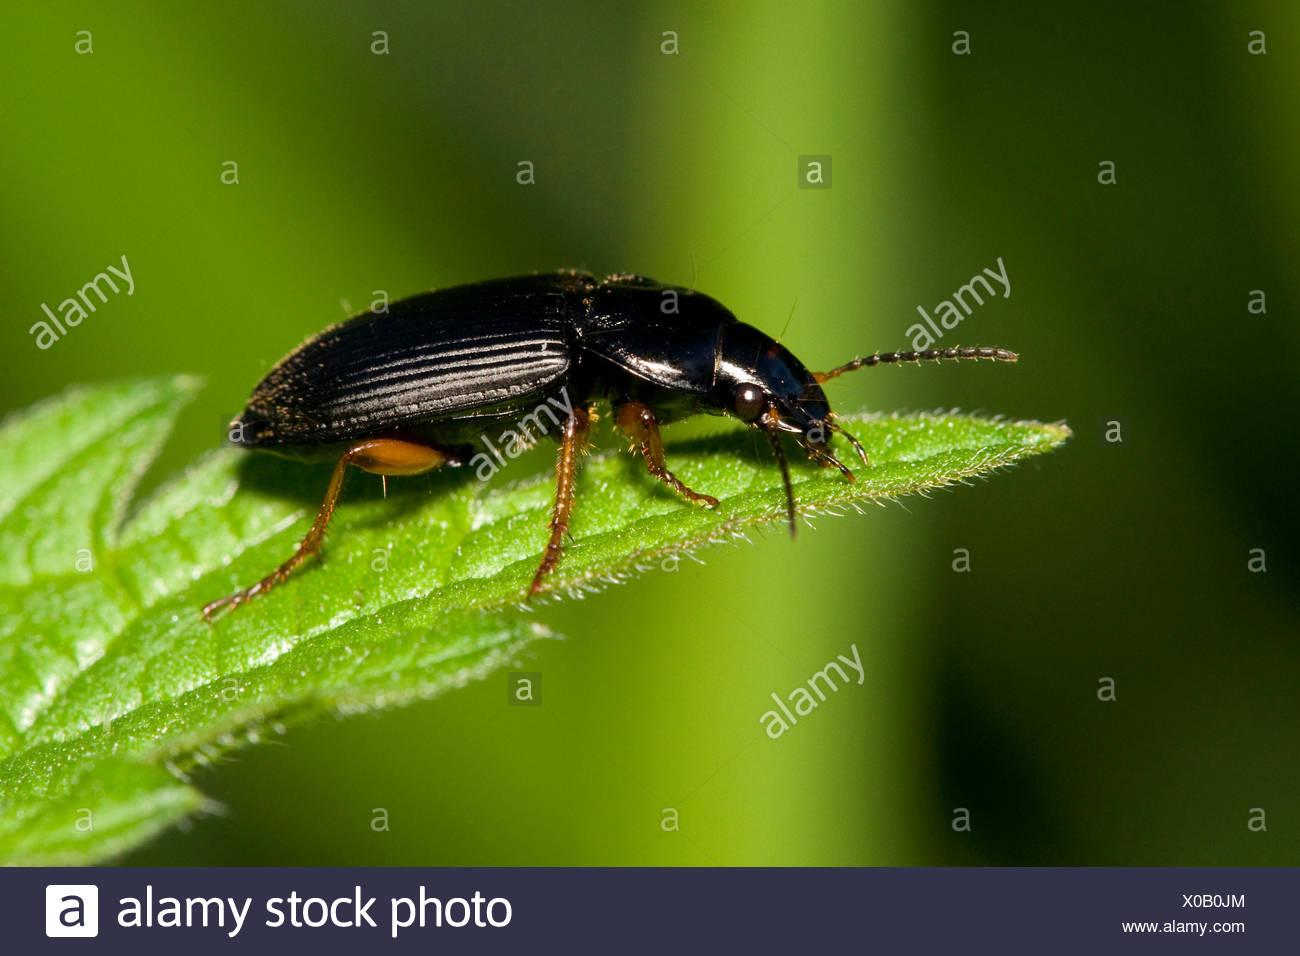 Vinegar Sprayer (Anisodactylus binotatus spurcaticornis), on a leaf, Germany - Stock Image